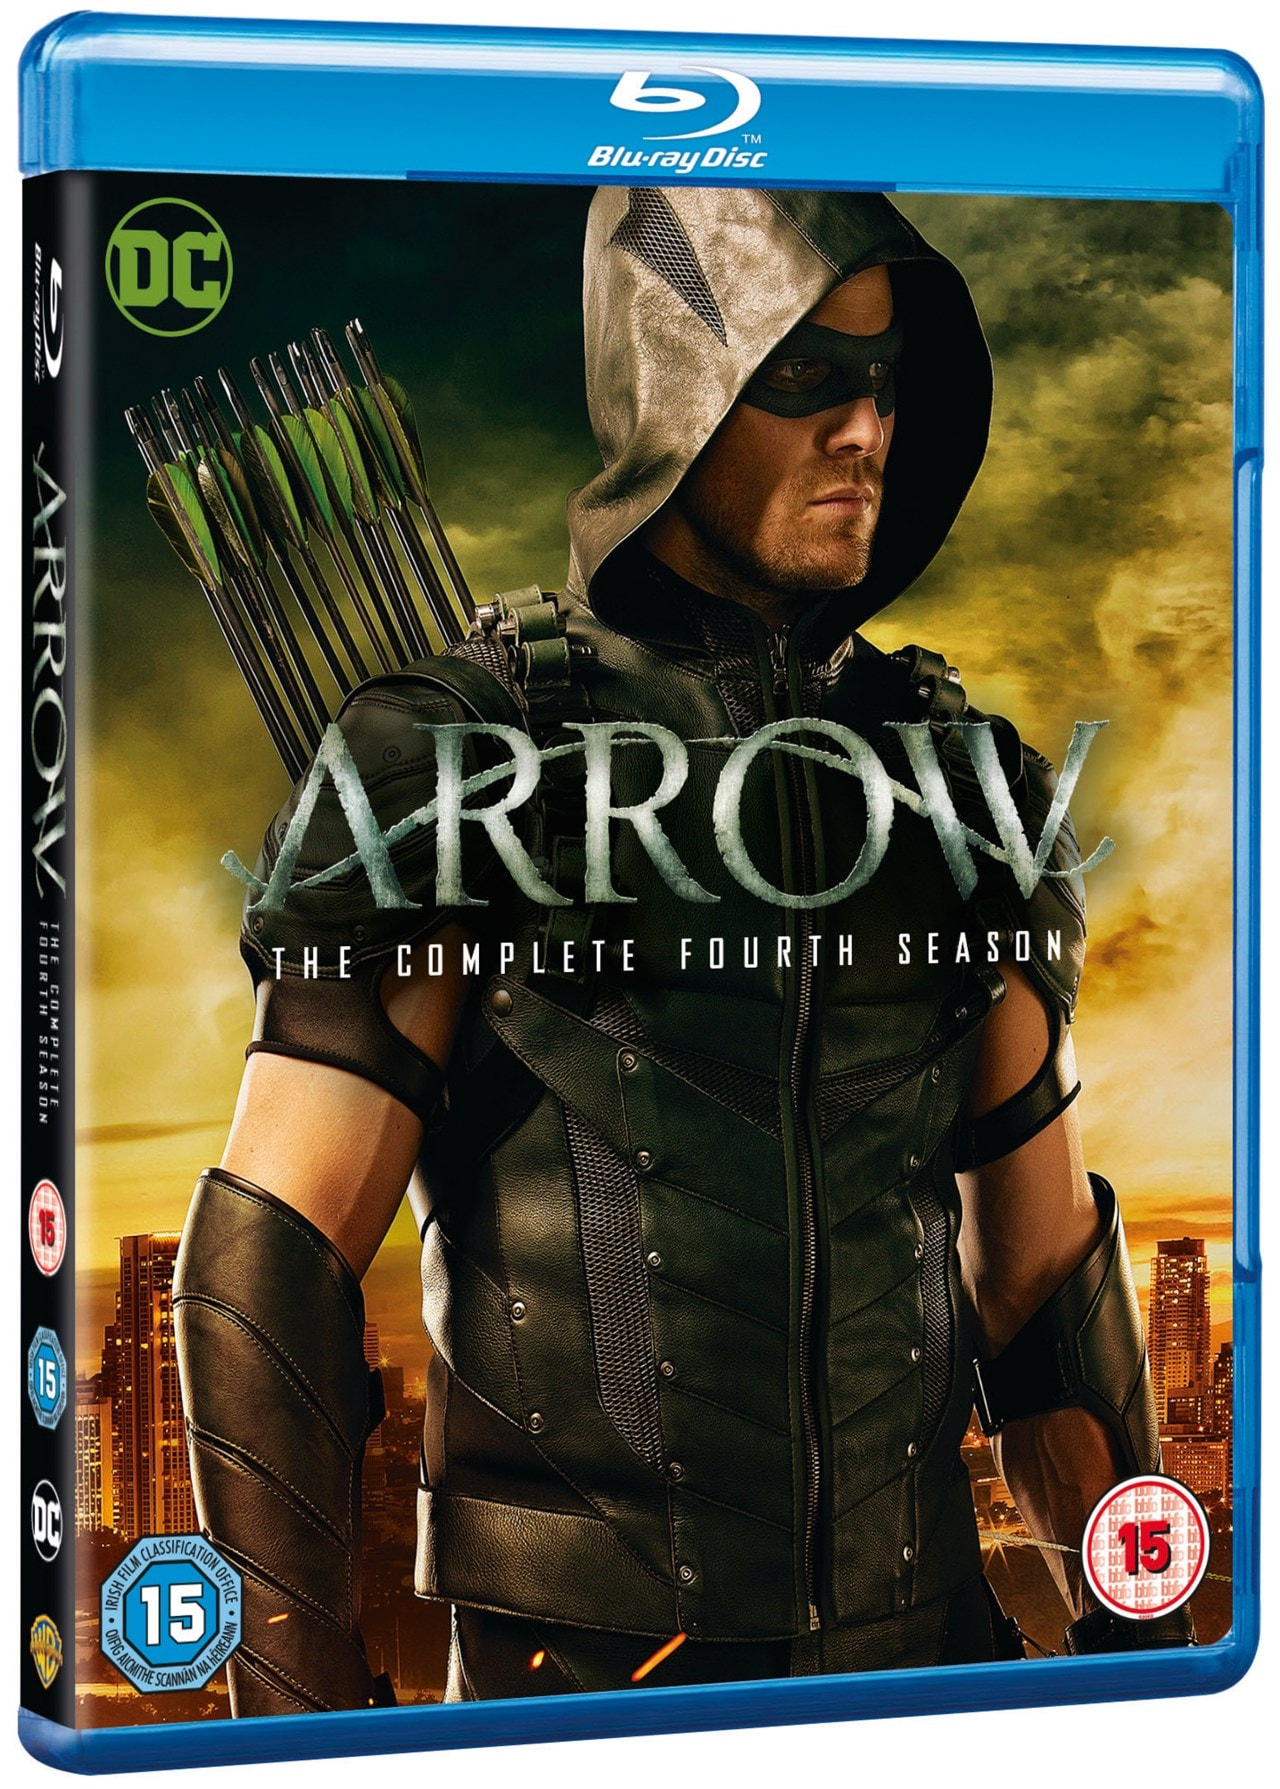 Arrow: The Complete Fourth Season - 2